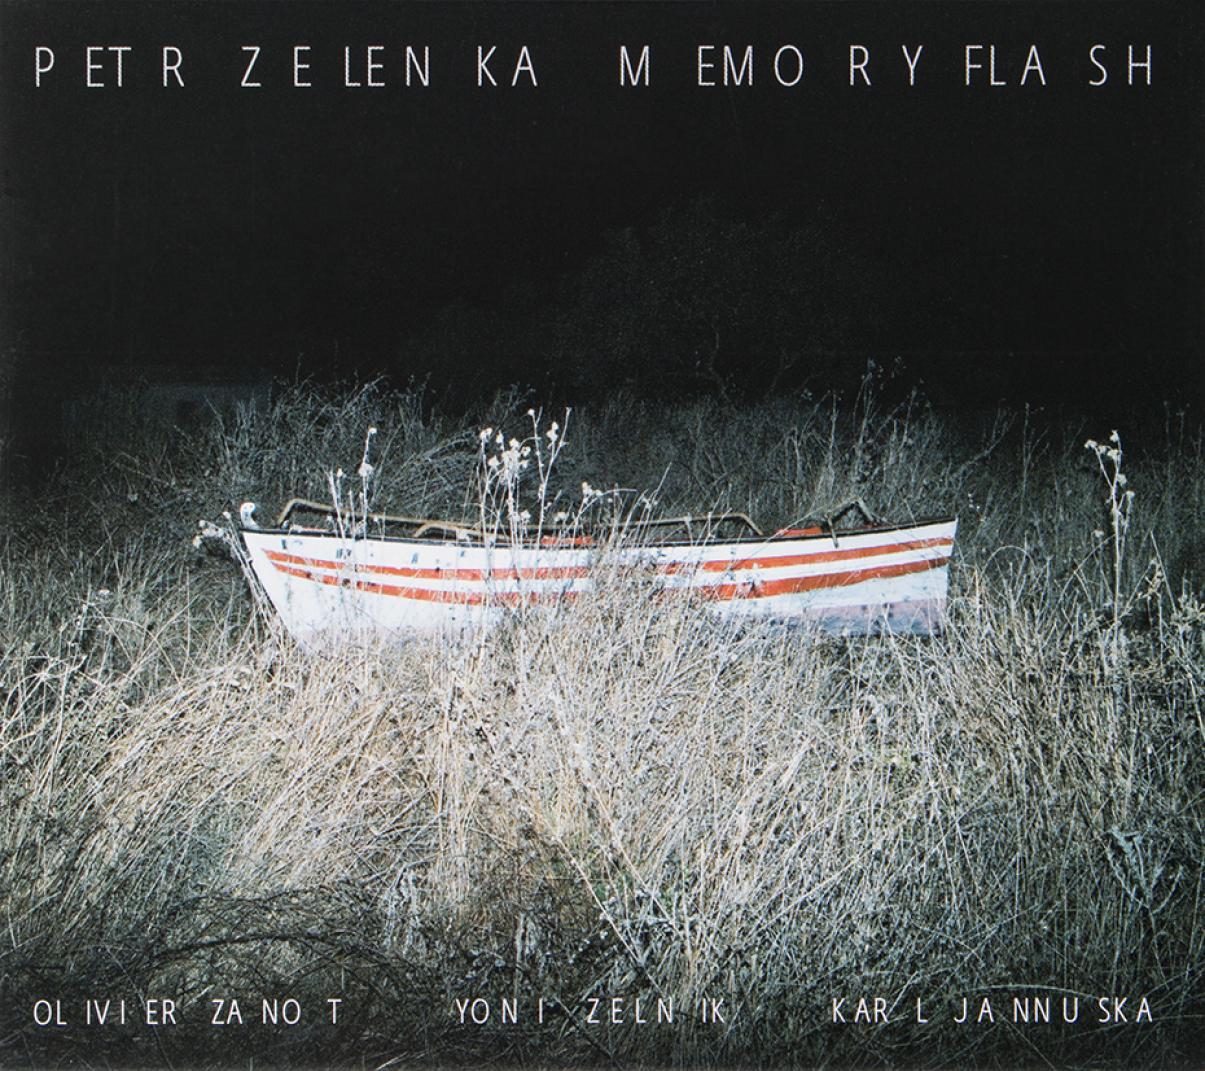 Petr Zelenka: Memory Flash